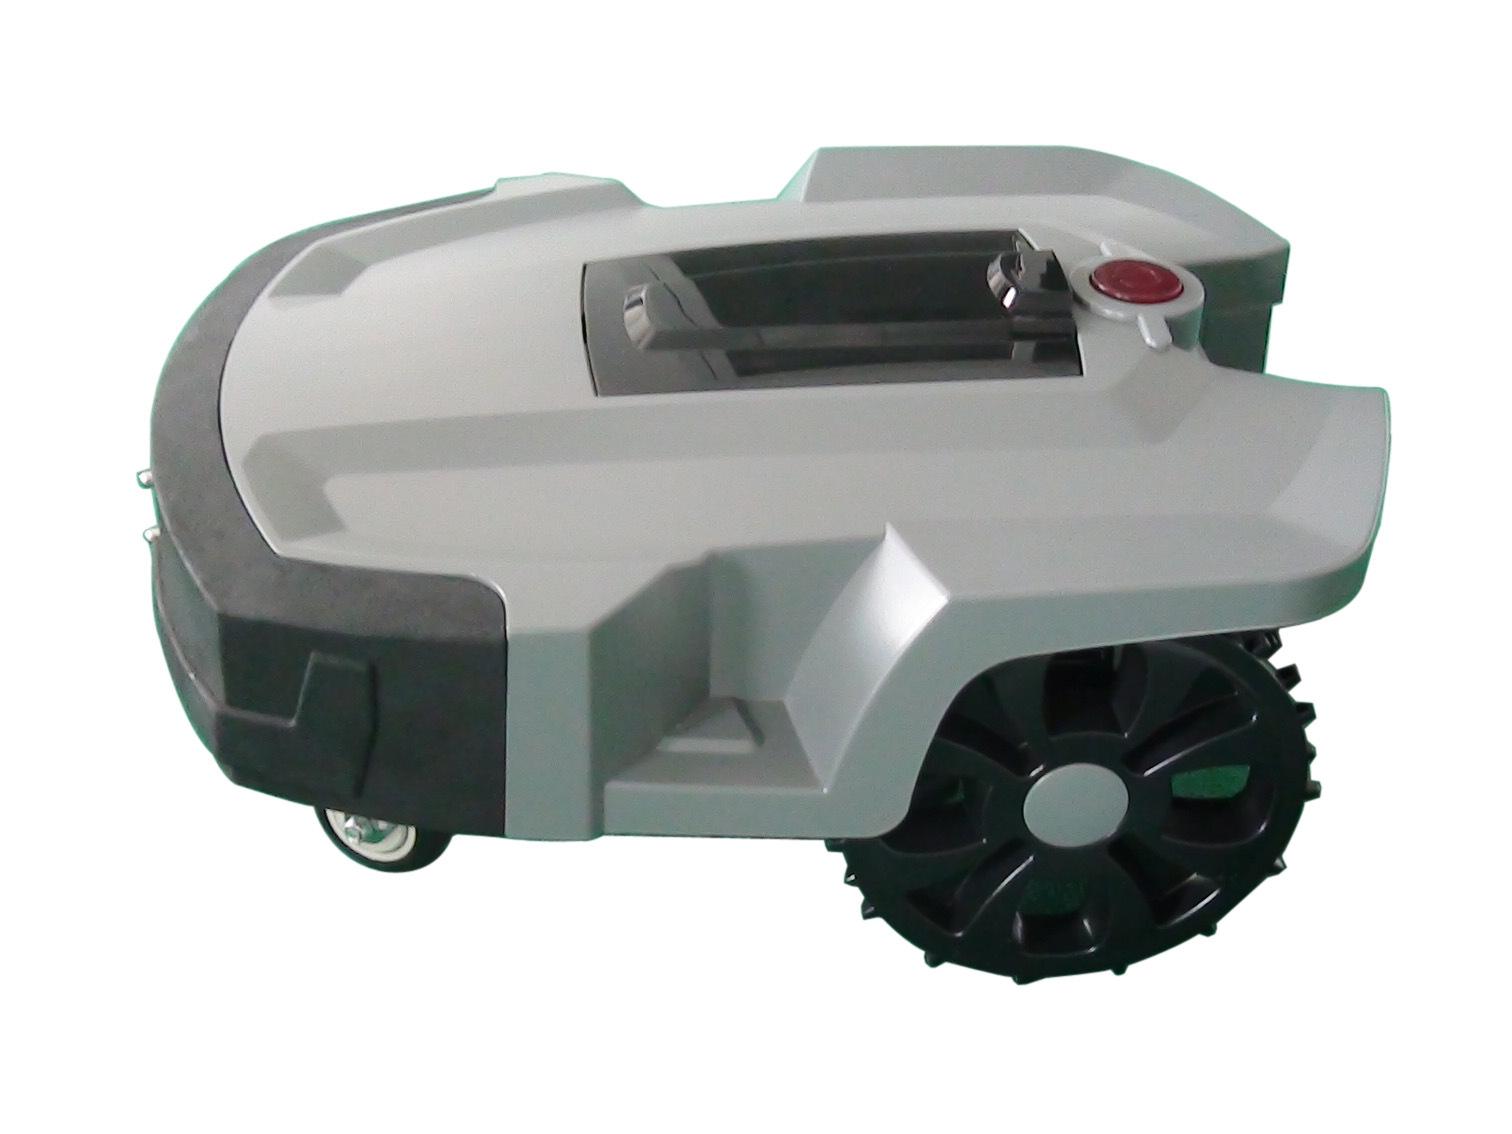 Robot cortac sped con bater a de litio 2012 2013 robot - Cortacesped automatico precio ...